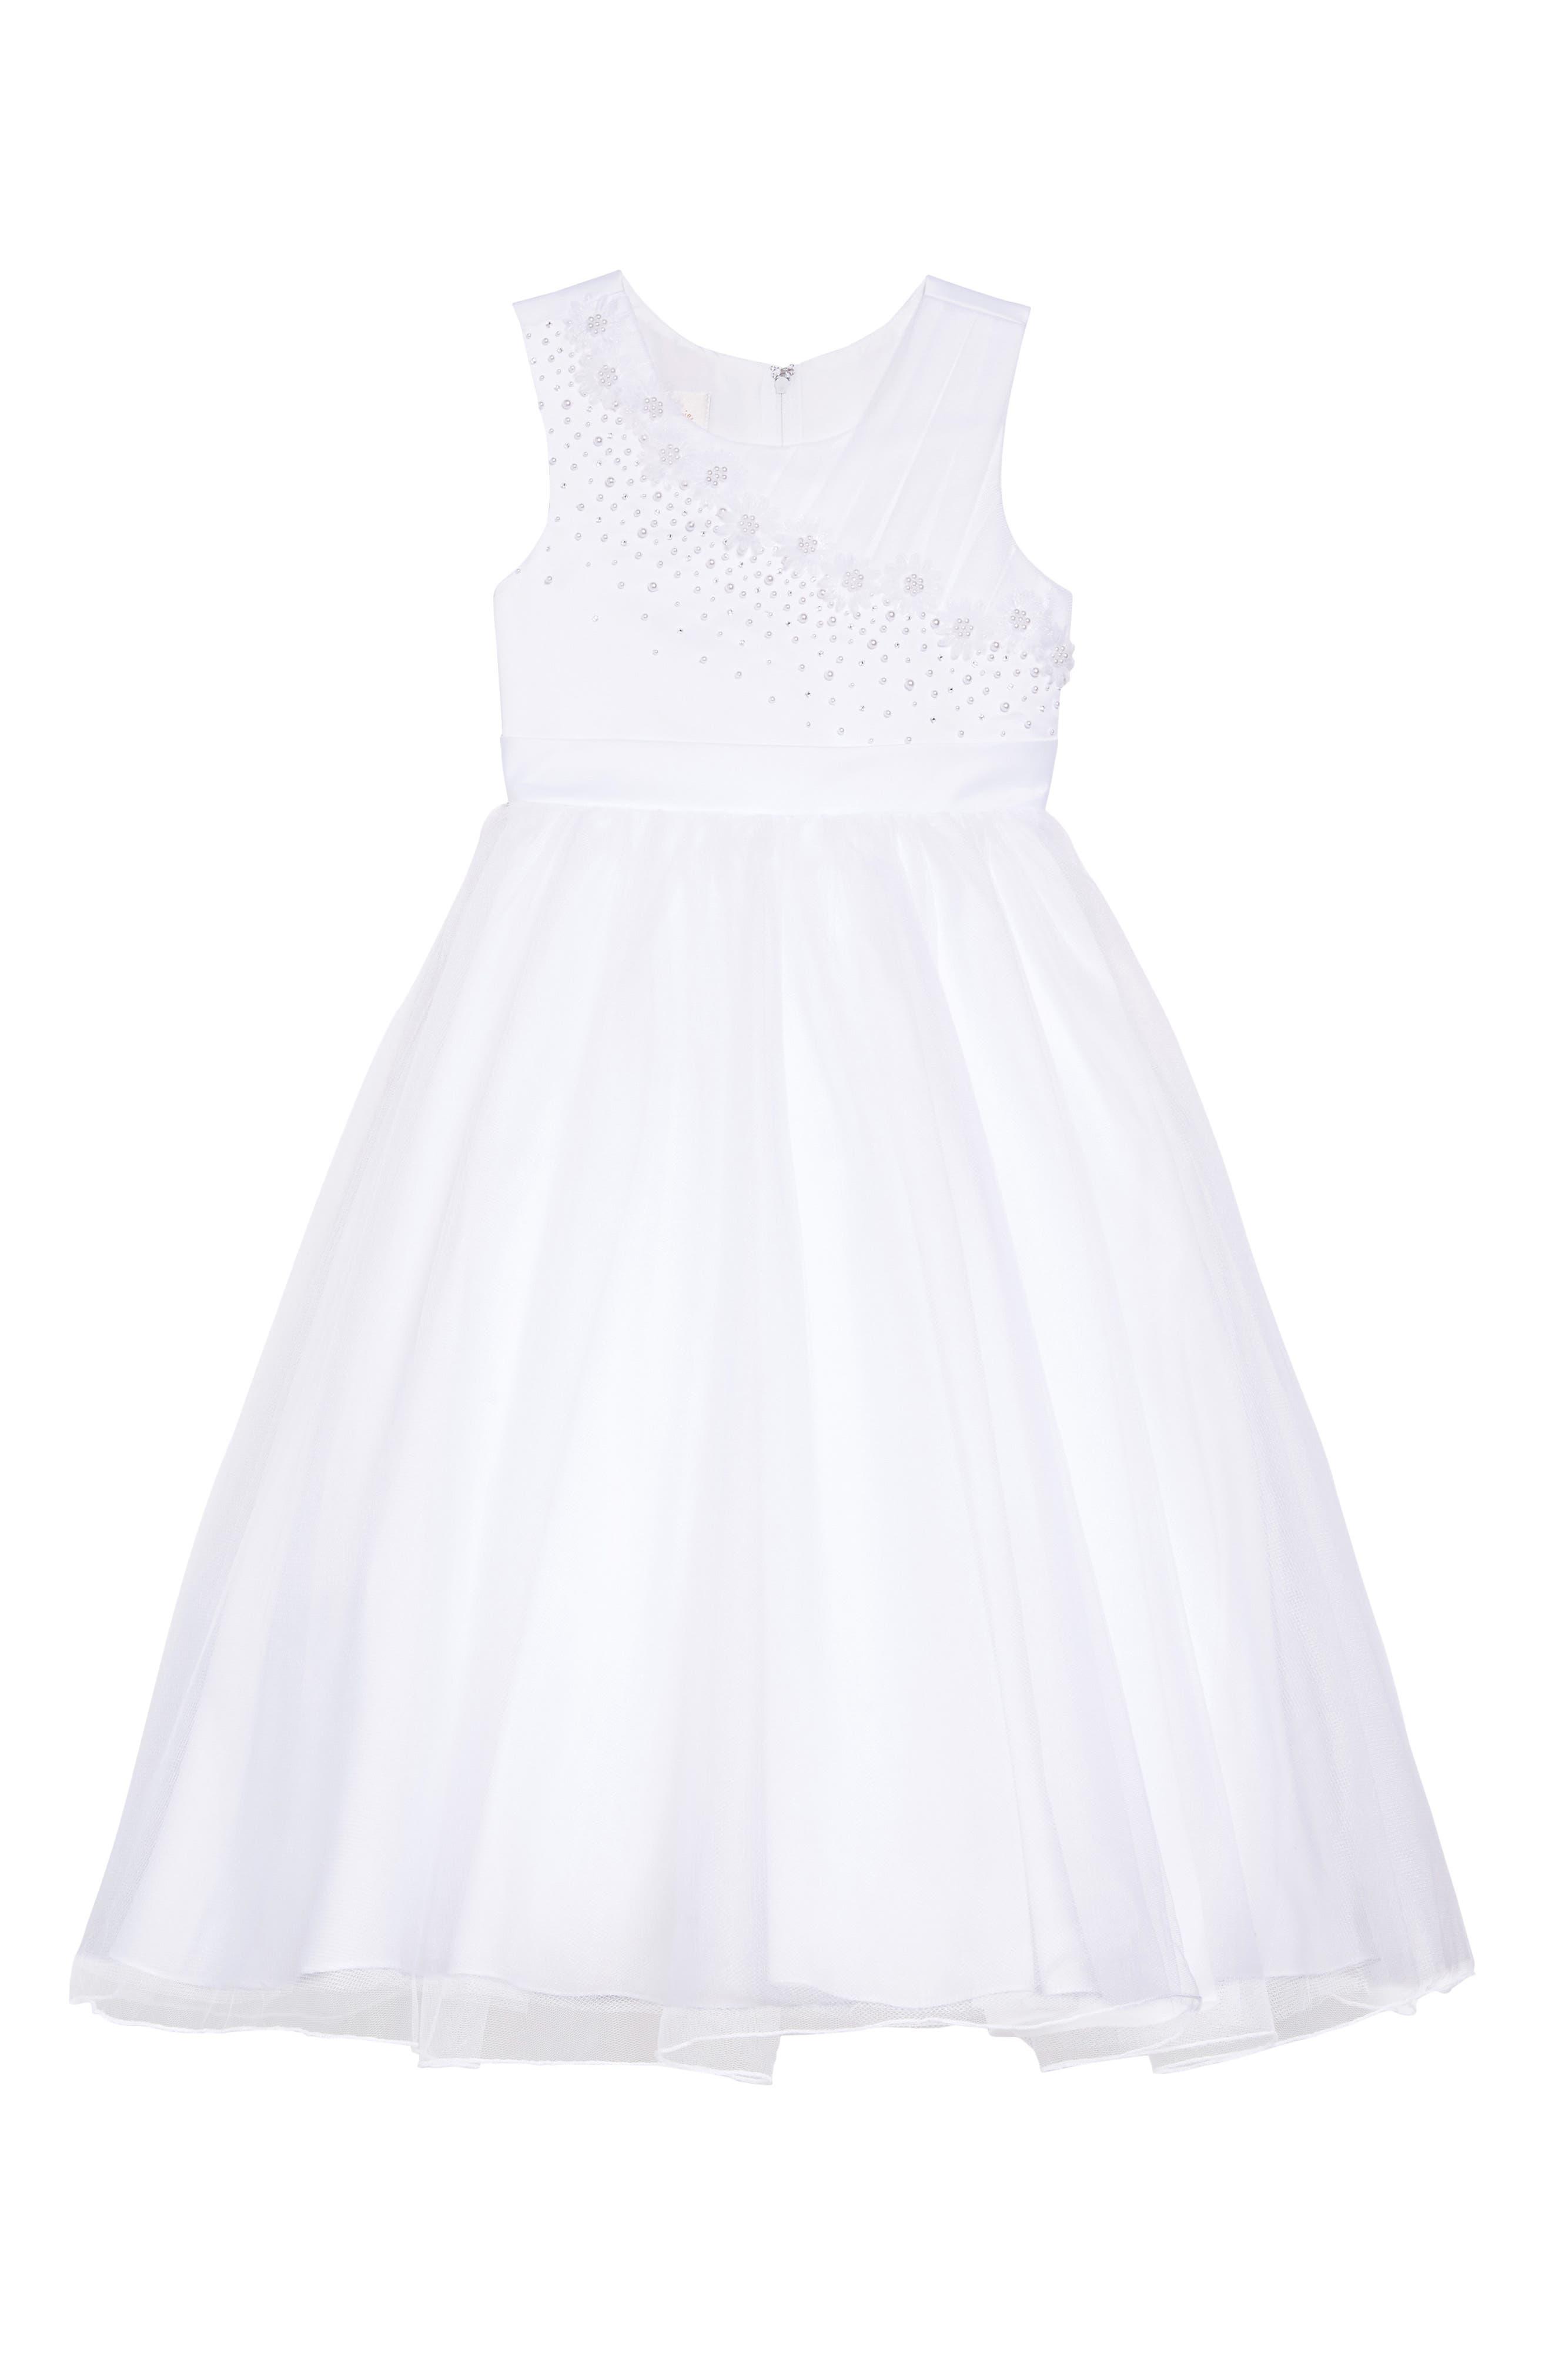 LAUREN MARIE, Imitation Pearl Tulle Dress, Main thumbnail 1, color, WHITE